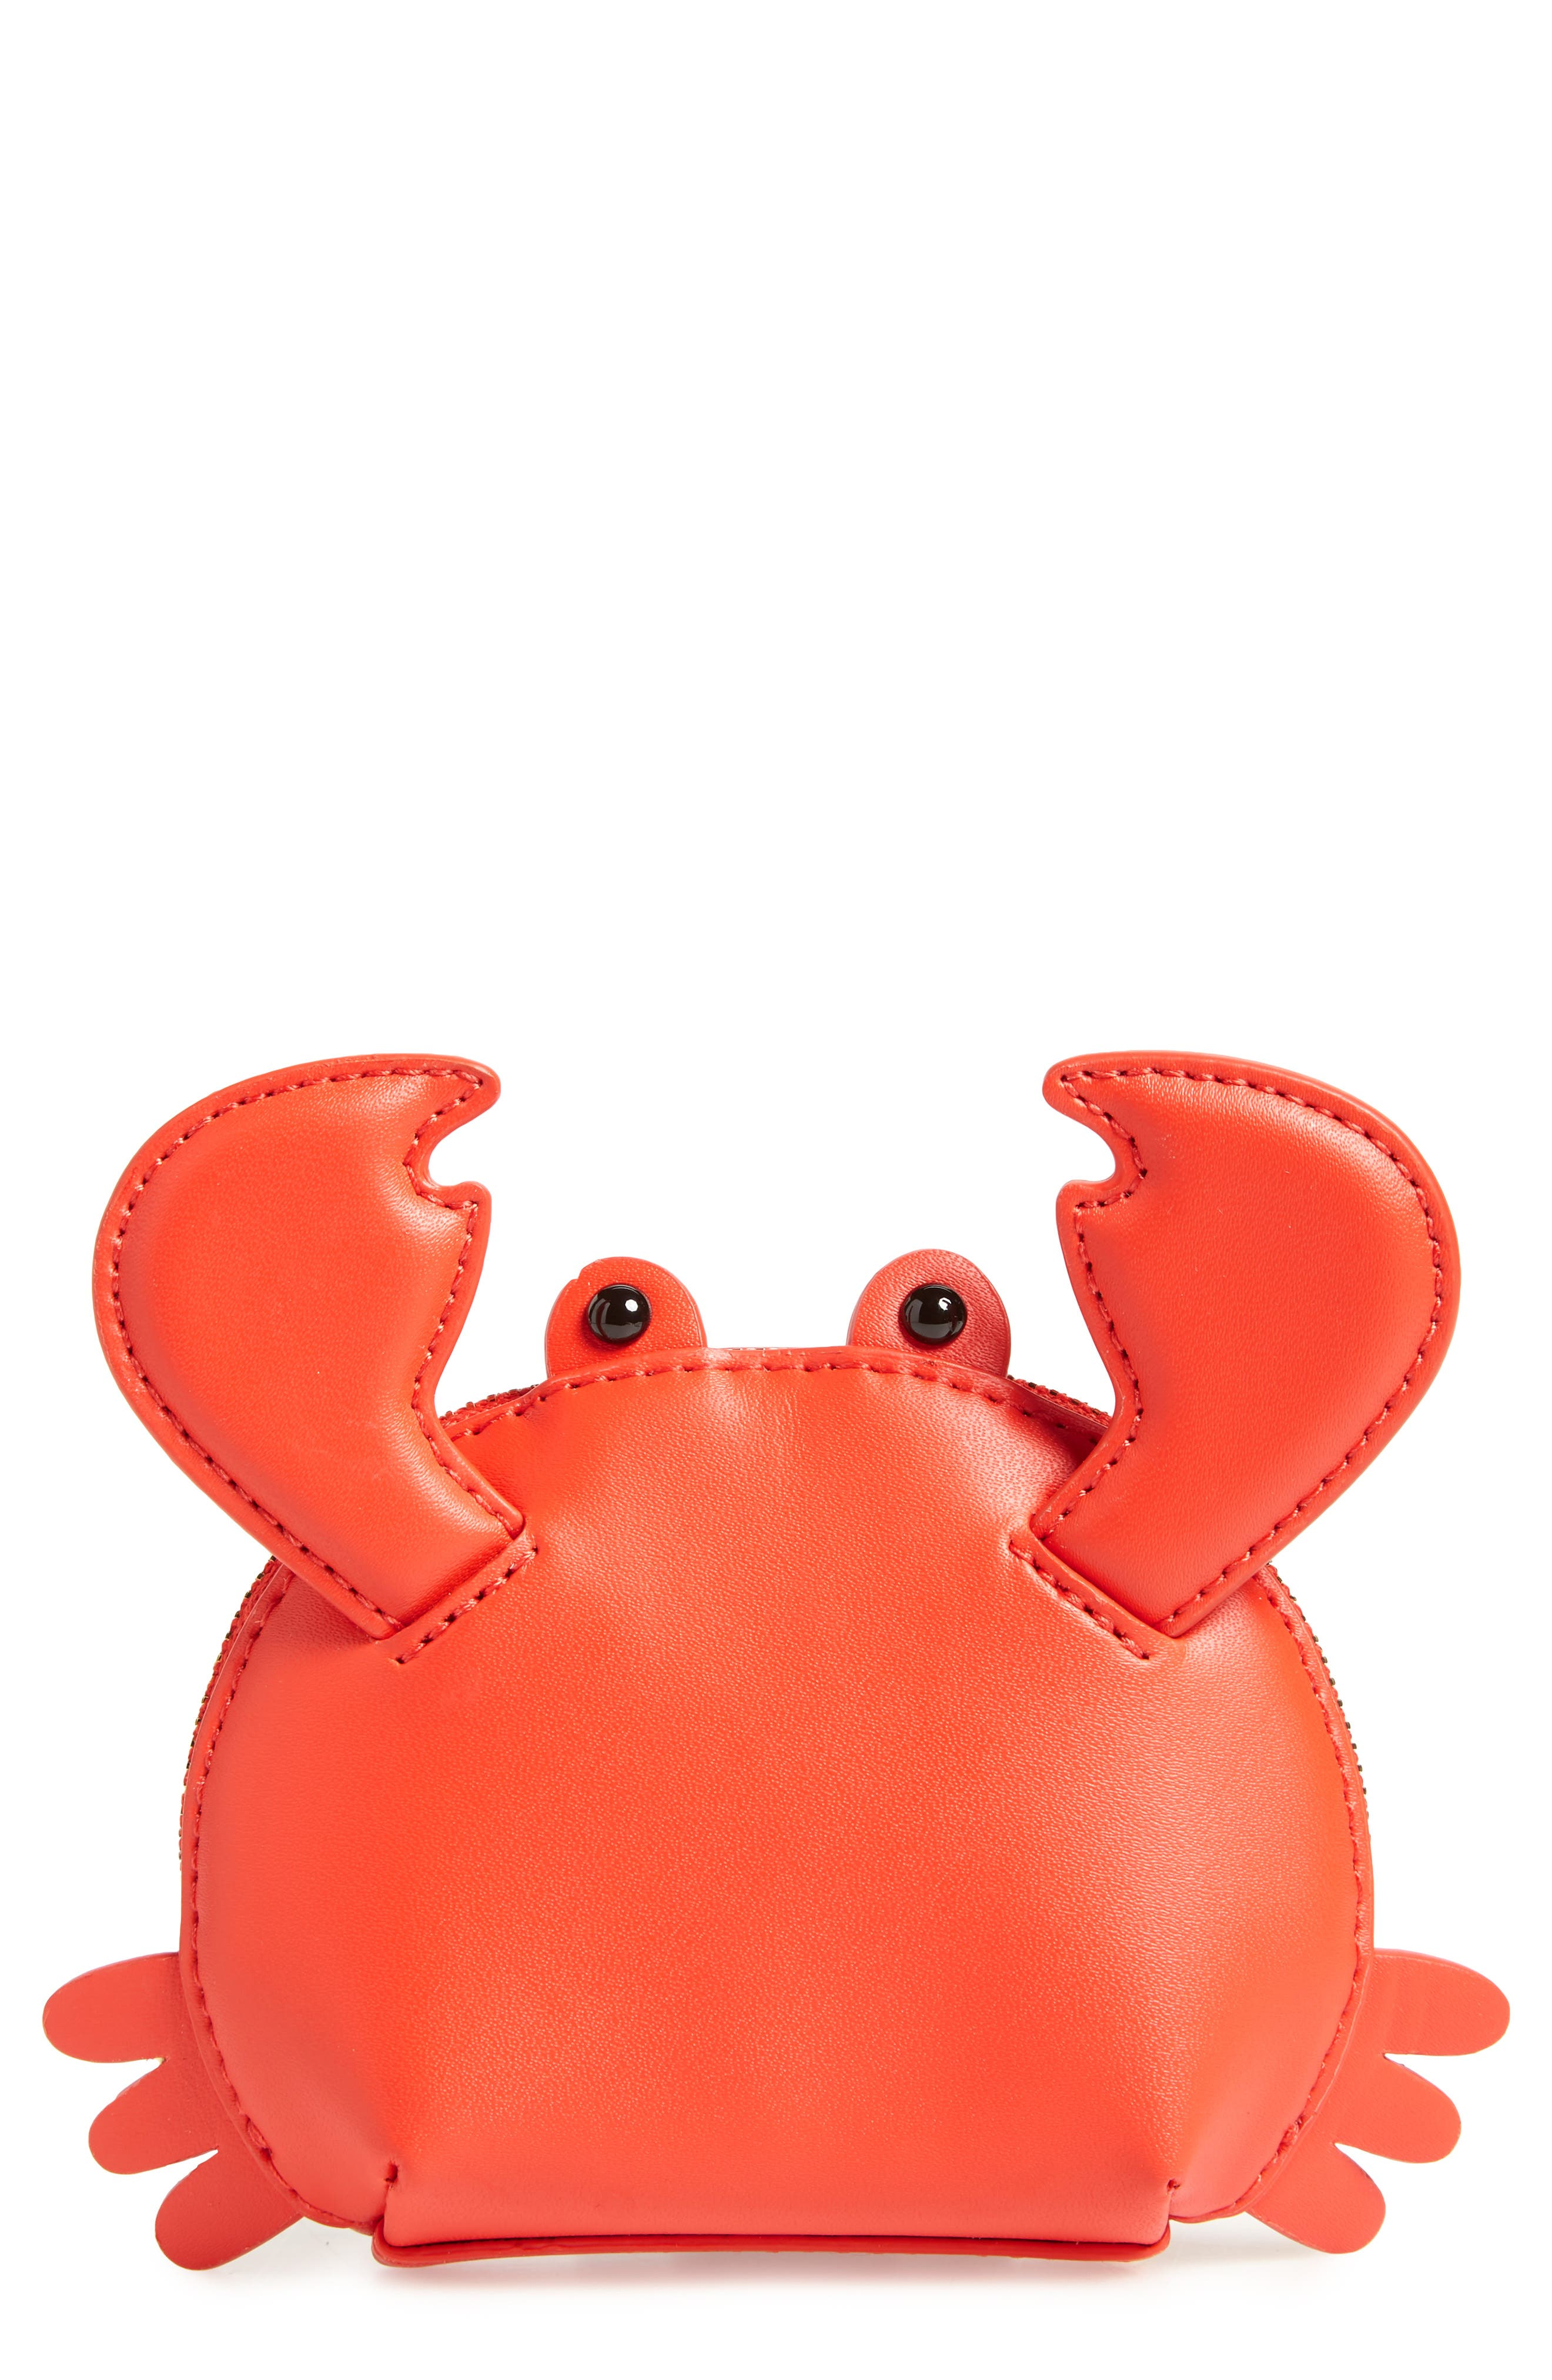 kate spade new york shore thing - crab coin purse